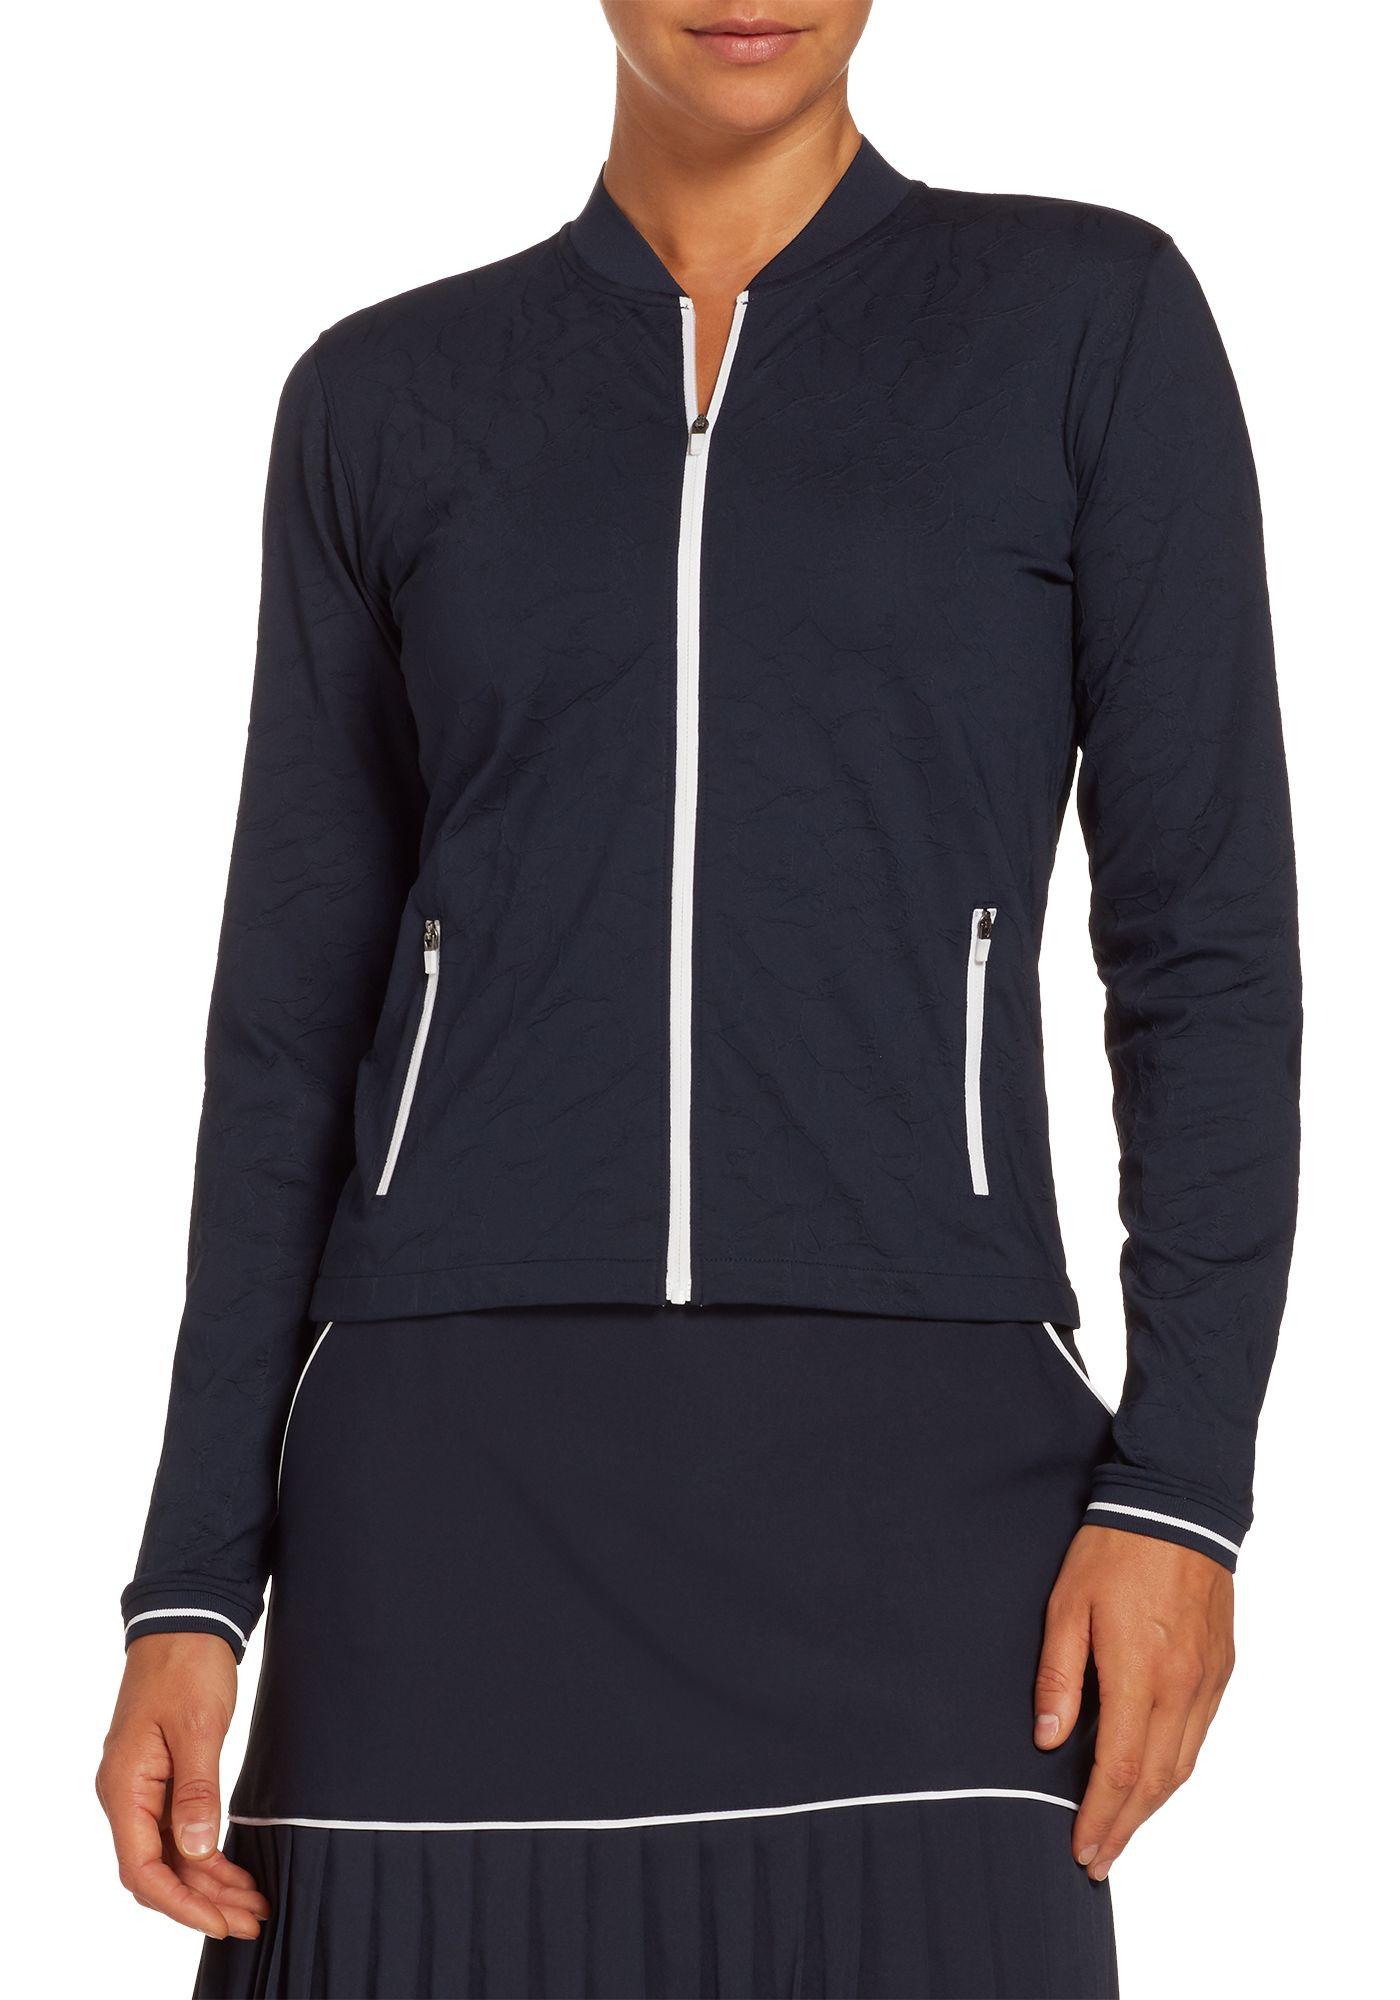 Lady Hagen Women's Texture Bomber Golf Jacket